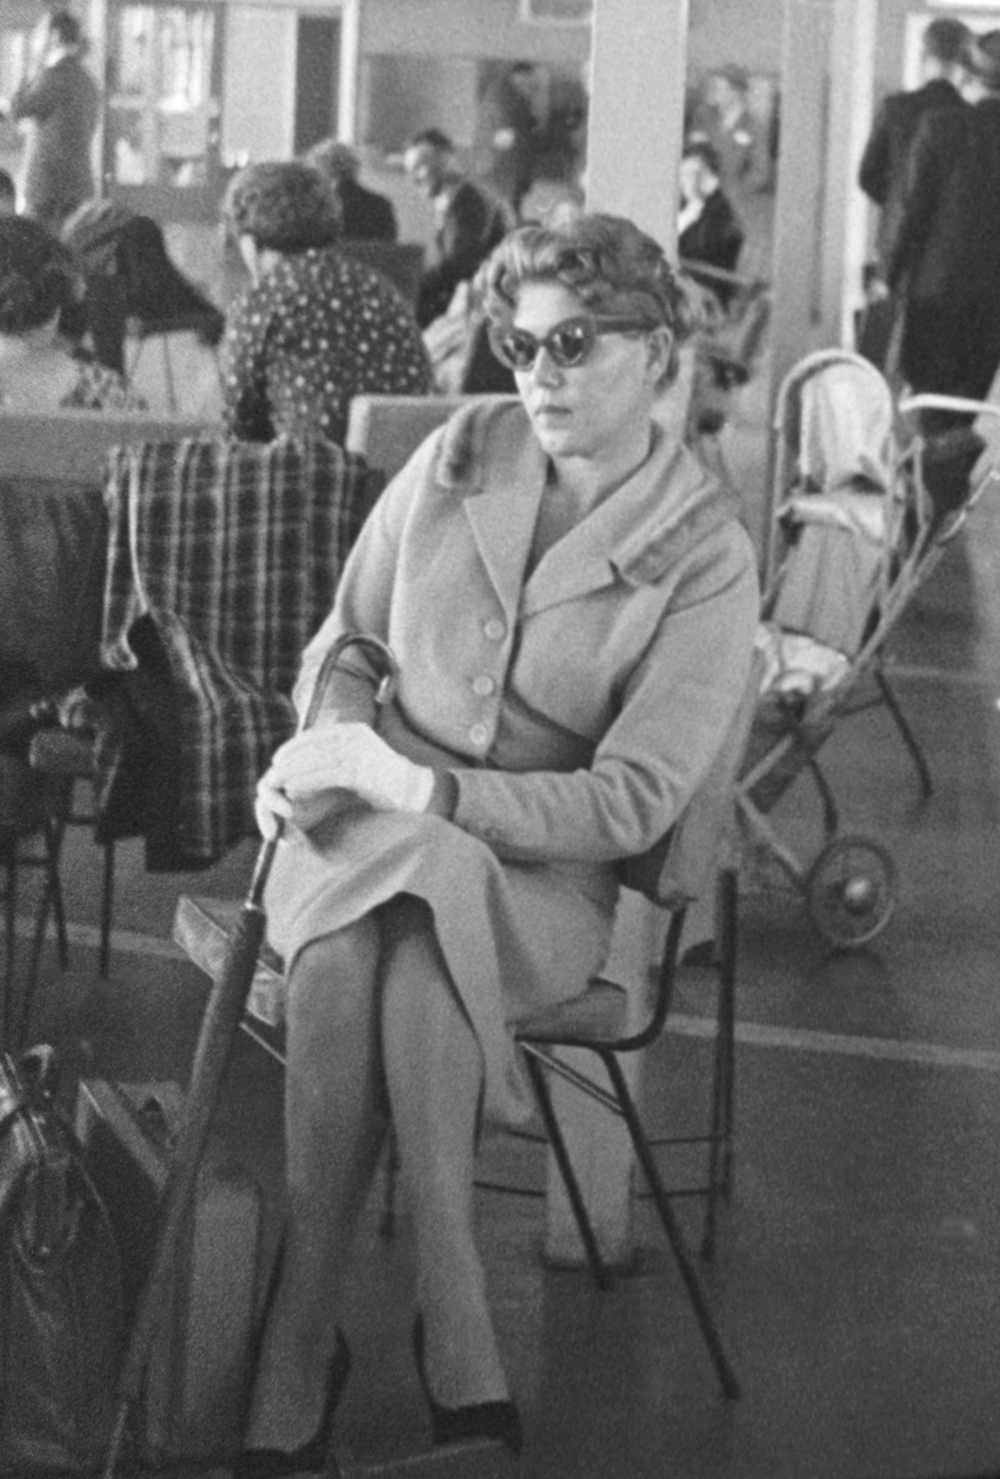 ASIO surveillance photograph of Lydia Janovska at Mascot Airport, Sydney, 1960.